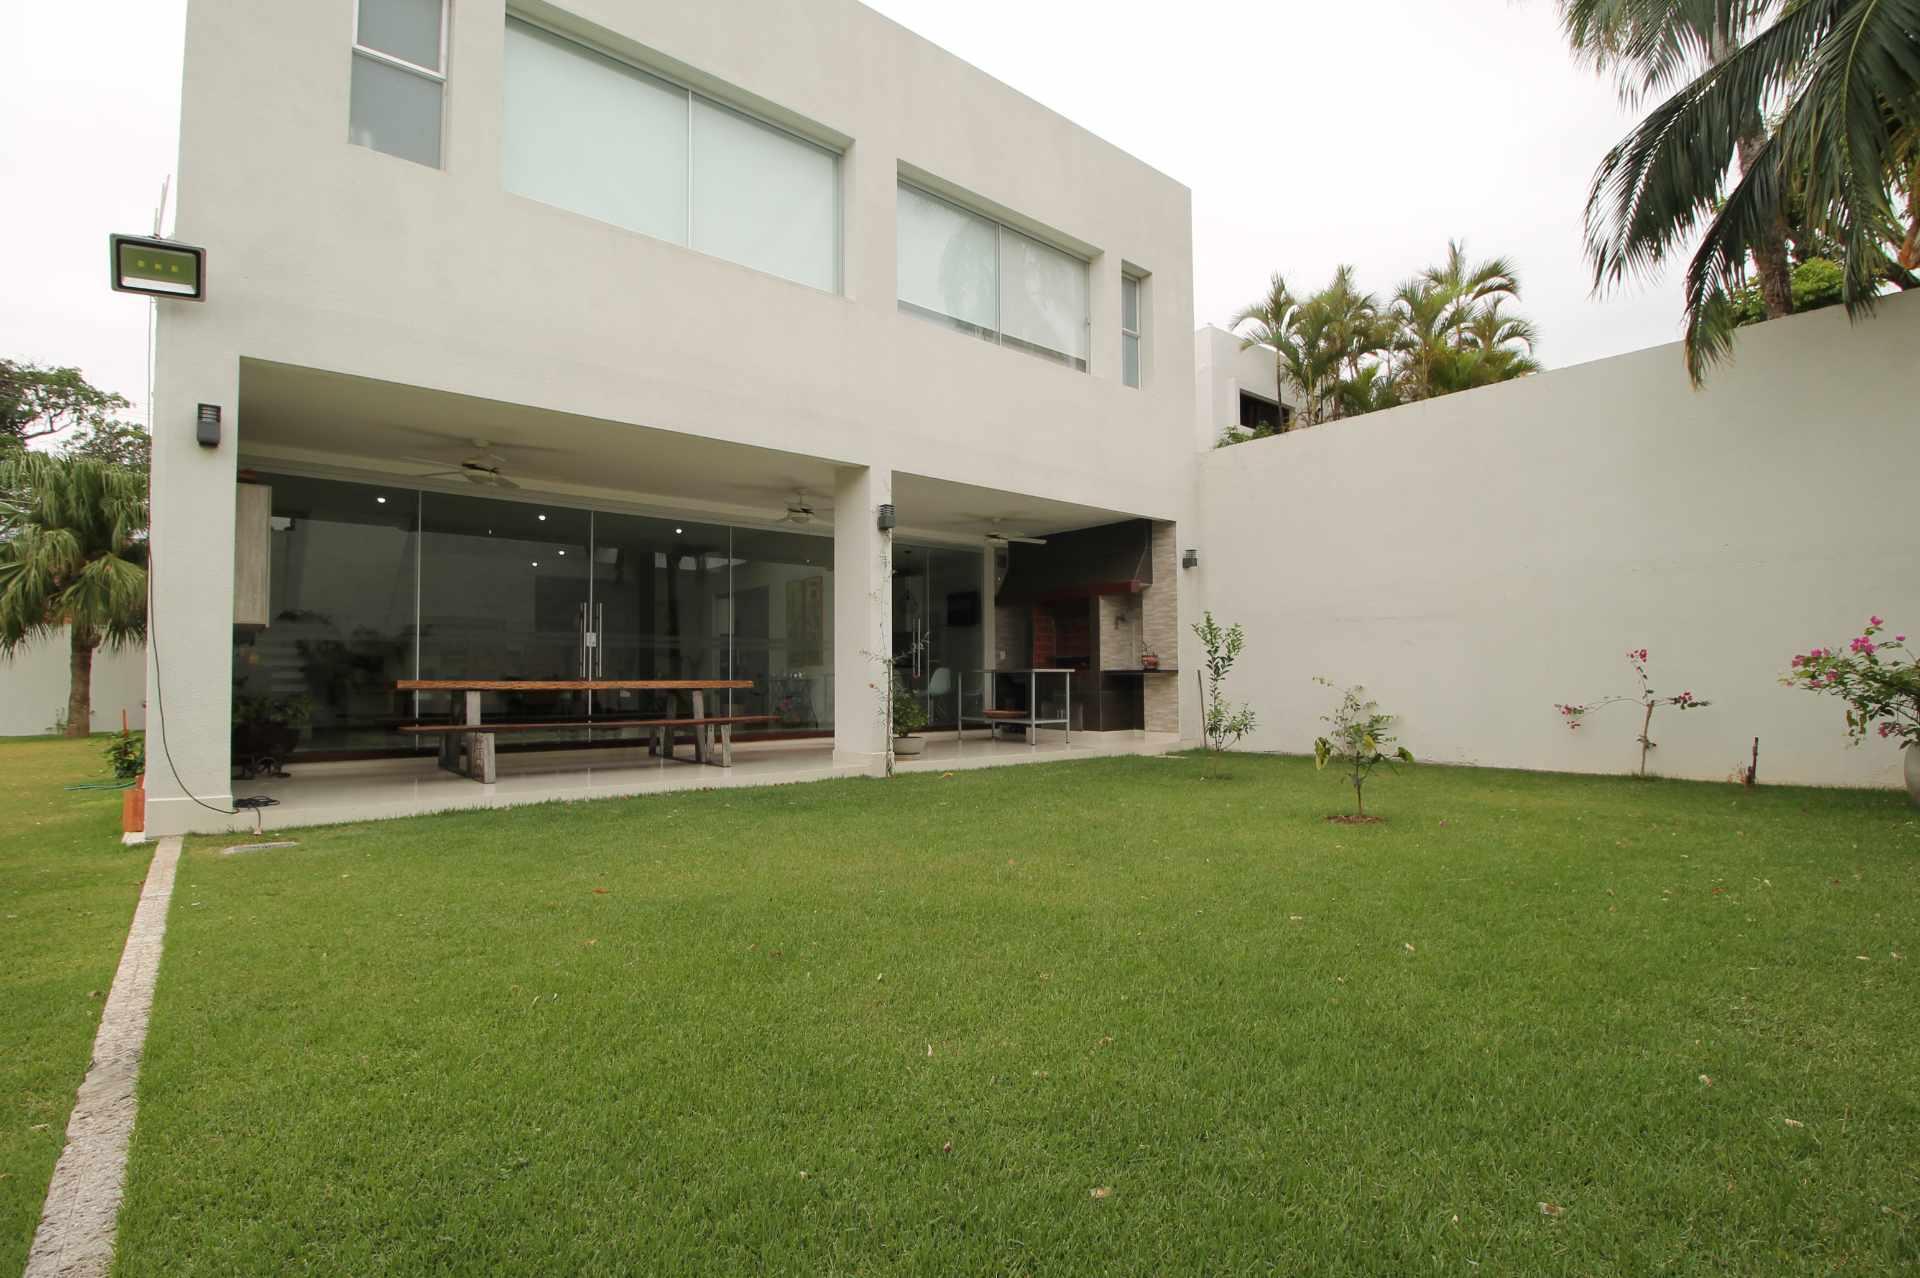 Casa en Alquiler Calle Chituri #41 Foto 8